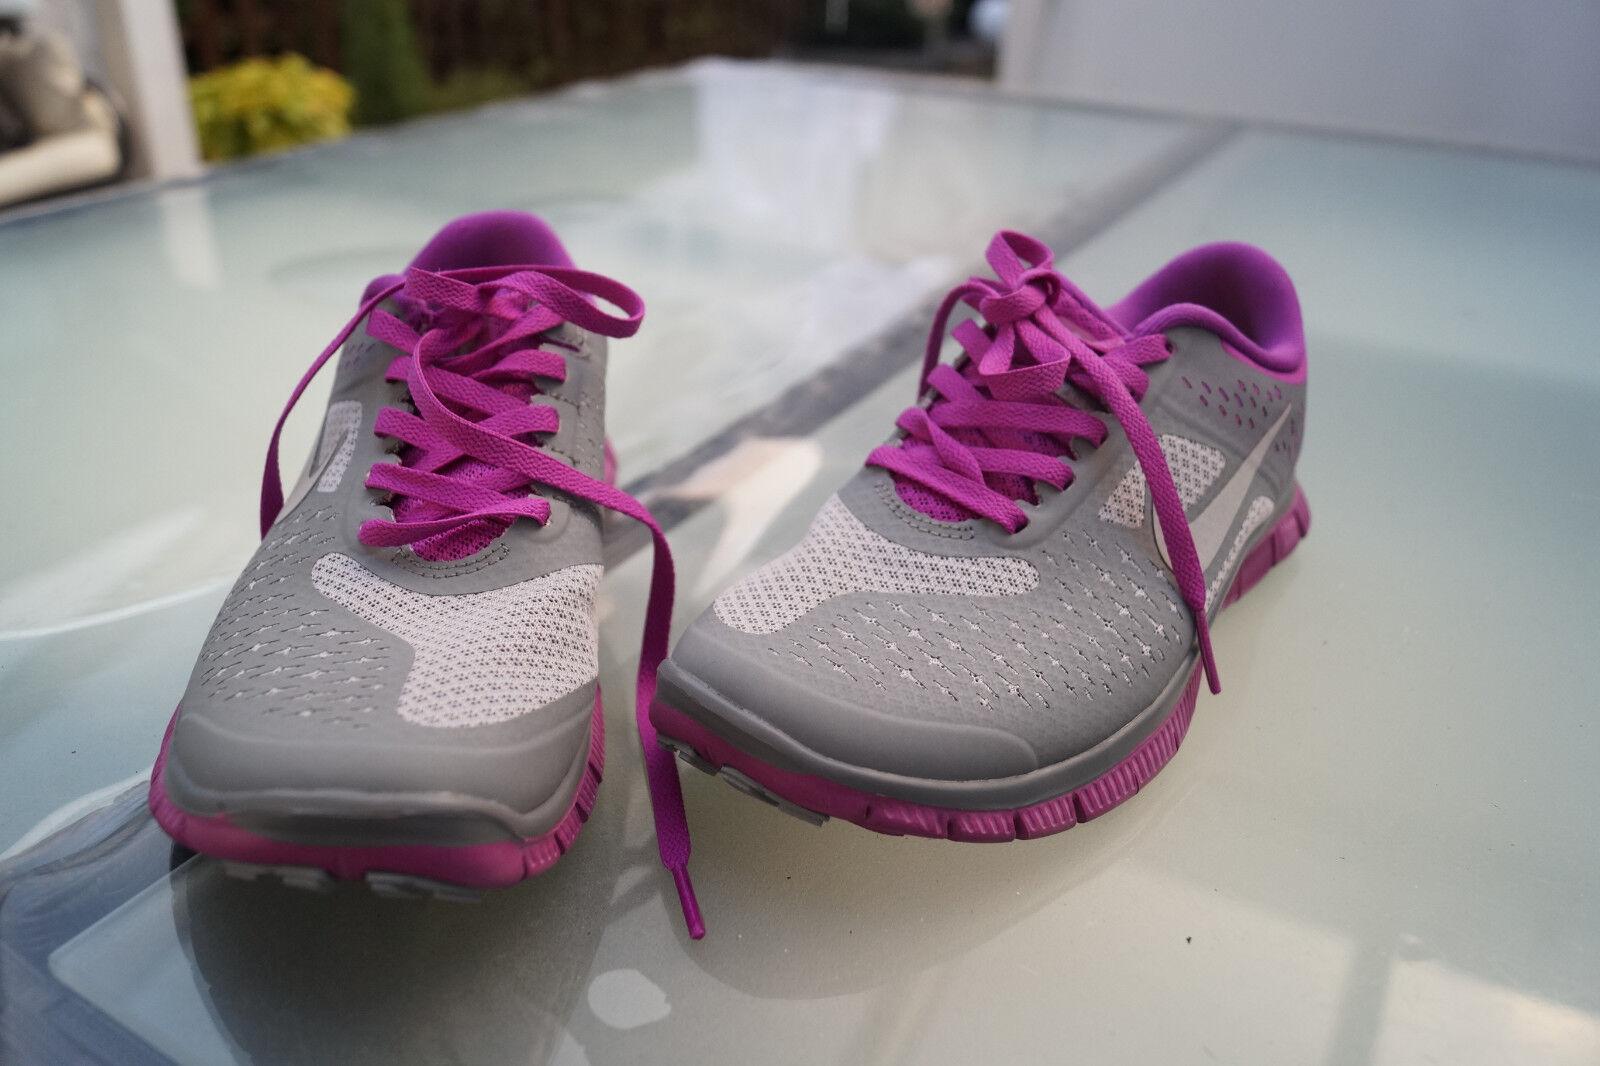 NIKE FREE 4.0 Damen Schuhe Sneaker Gr.36 grau lila NEU #b